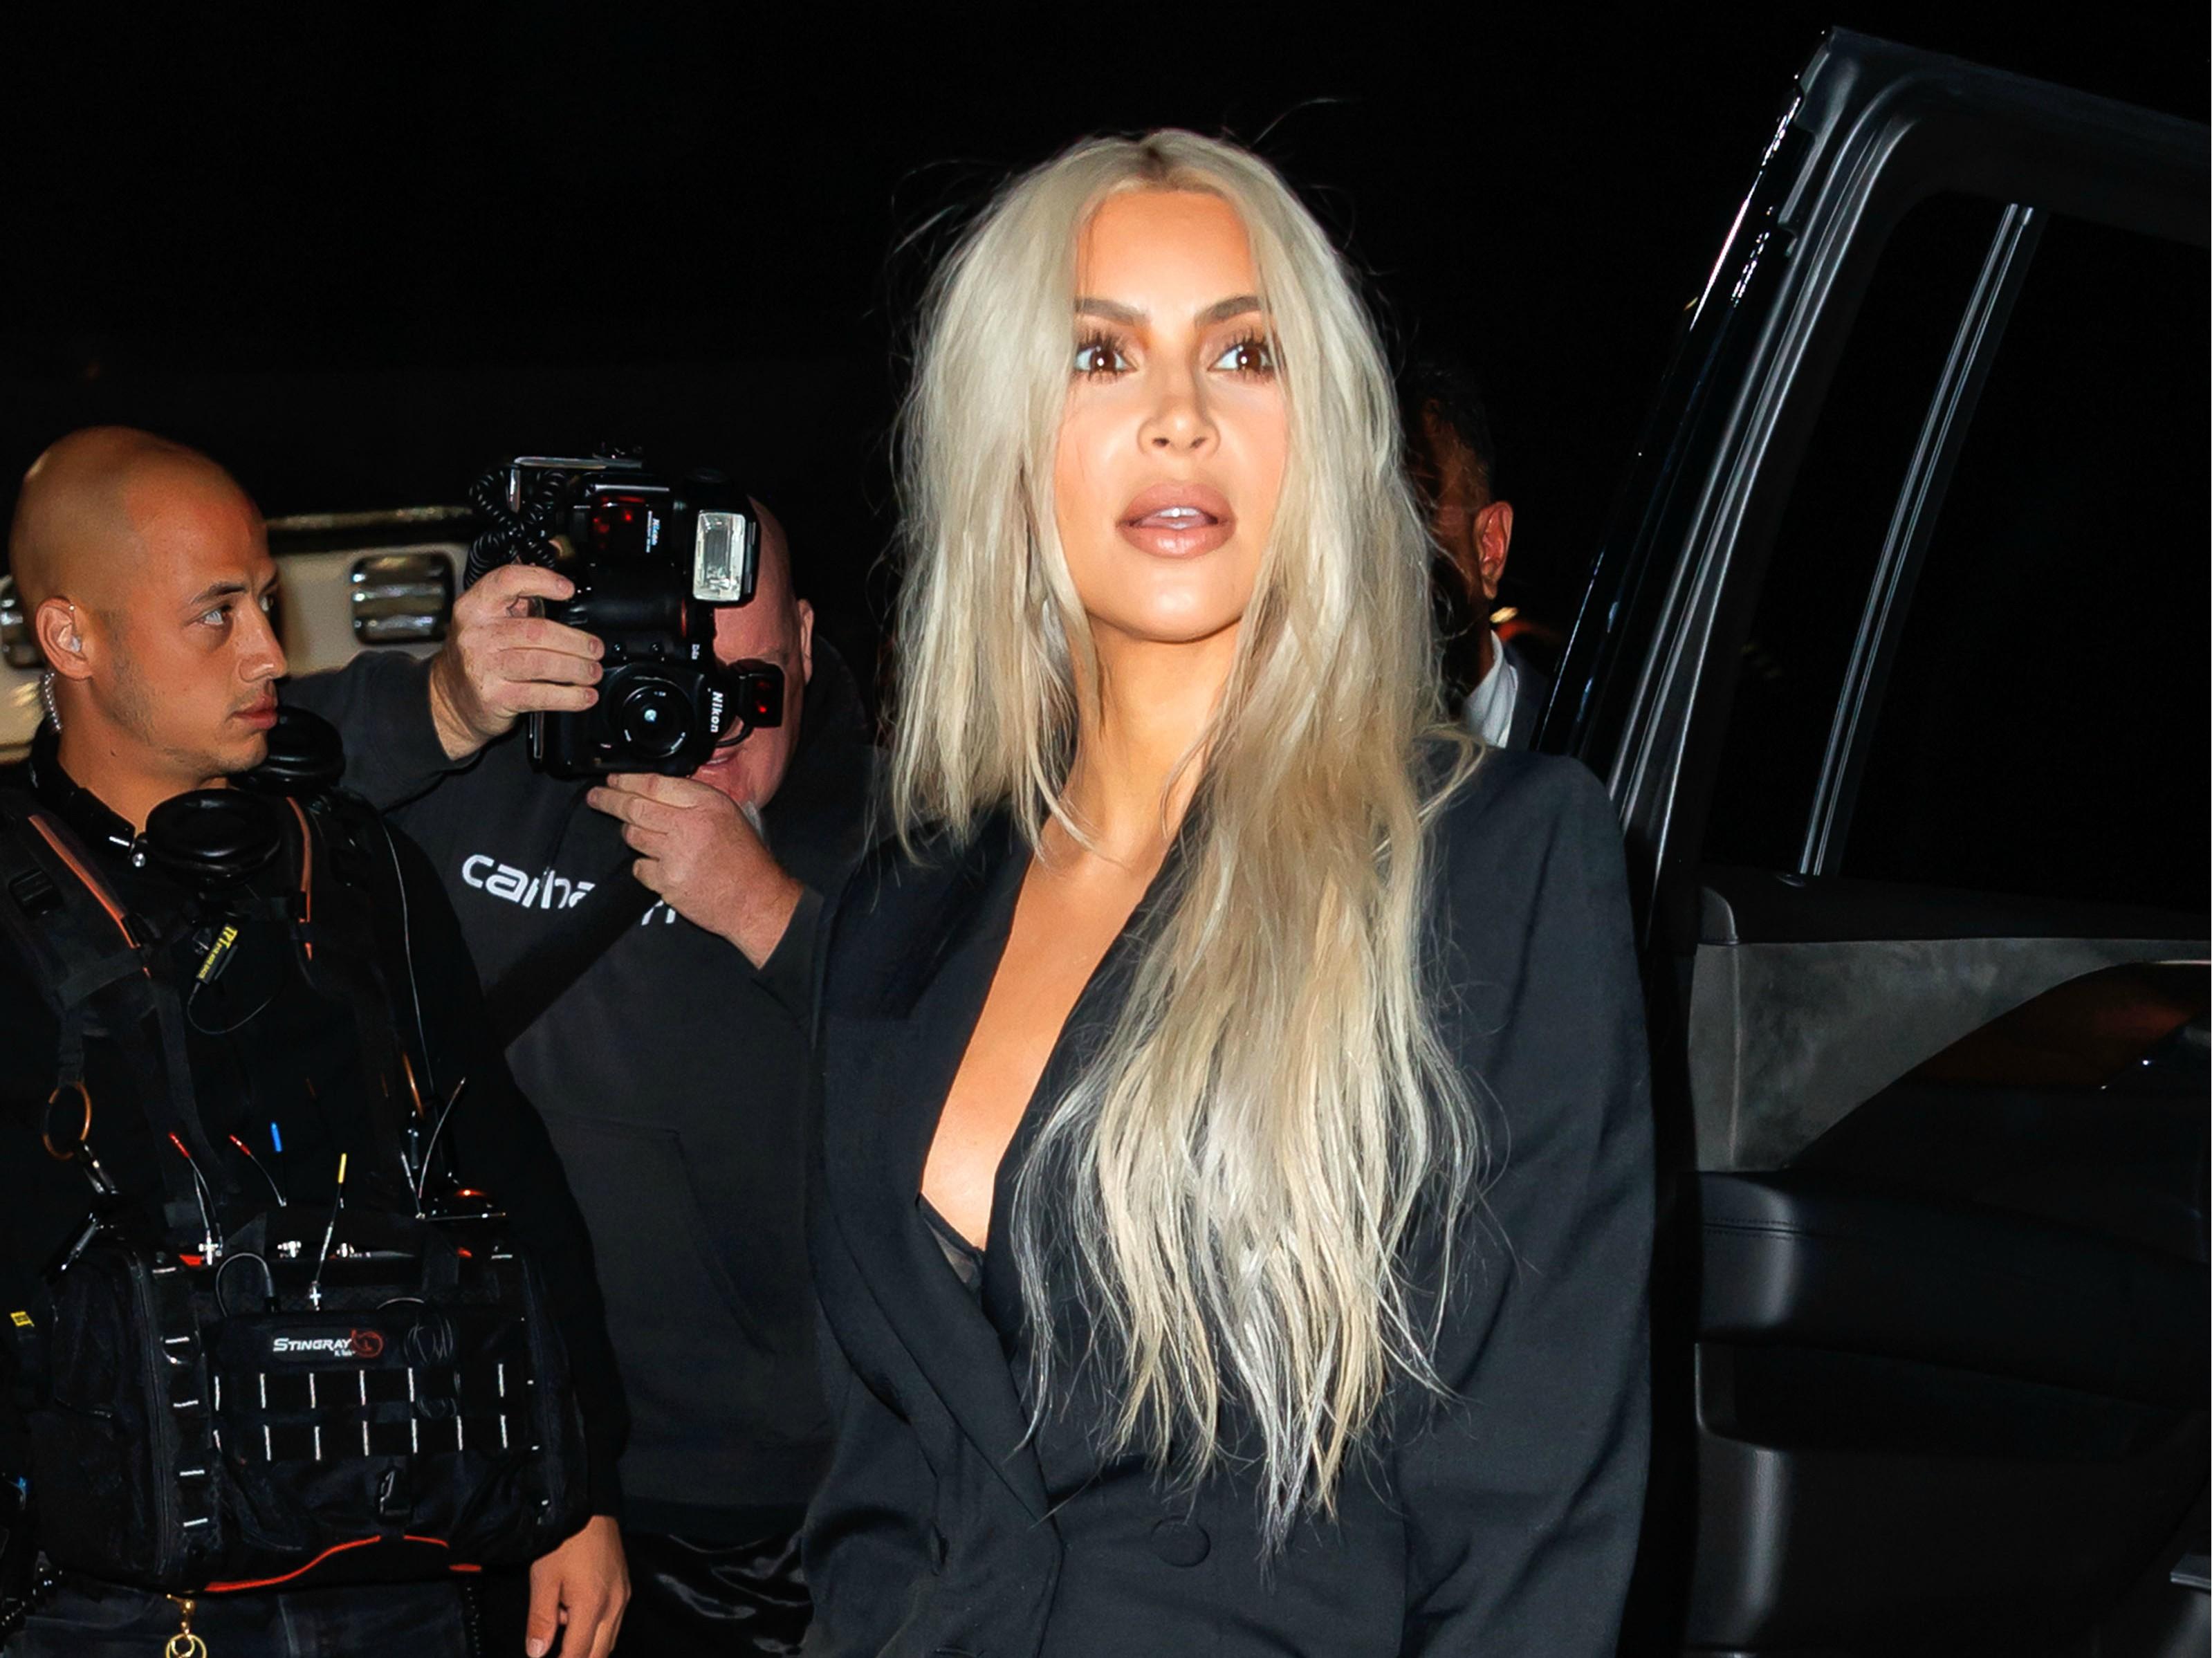 Kim Kardashian Shares Holiday Family Photo After Deleting Christmas Card Snaps